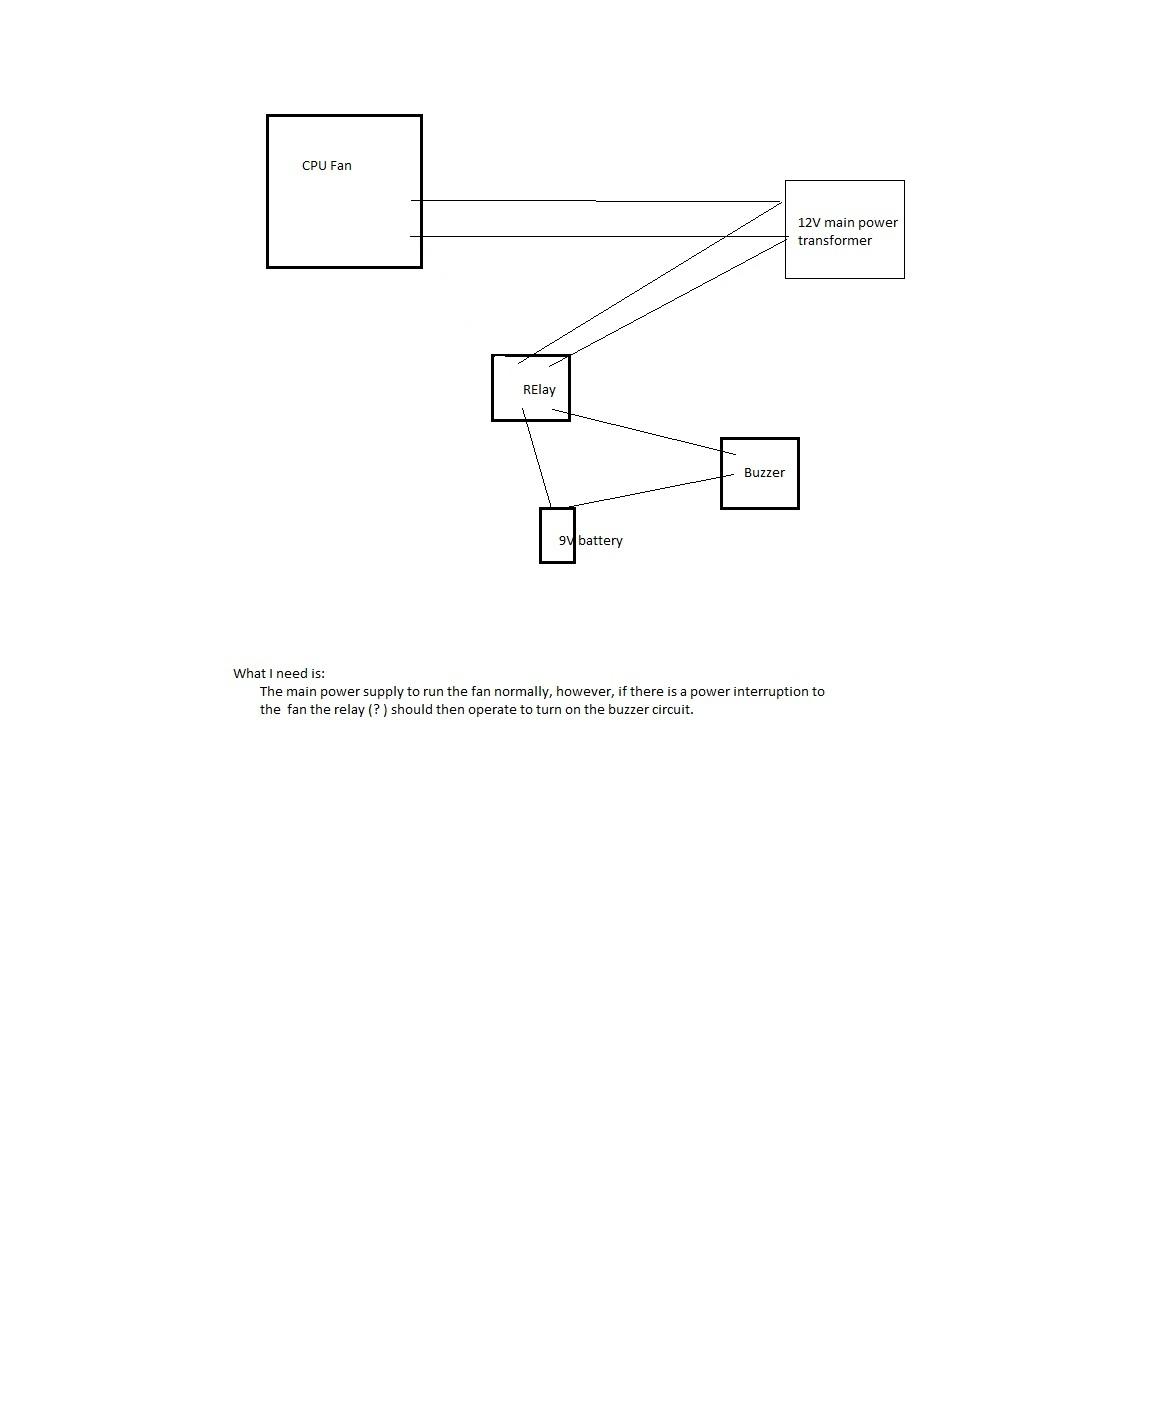 12V power supply failure alarm-alarm-circuit.jpg